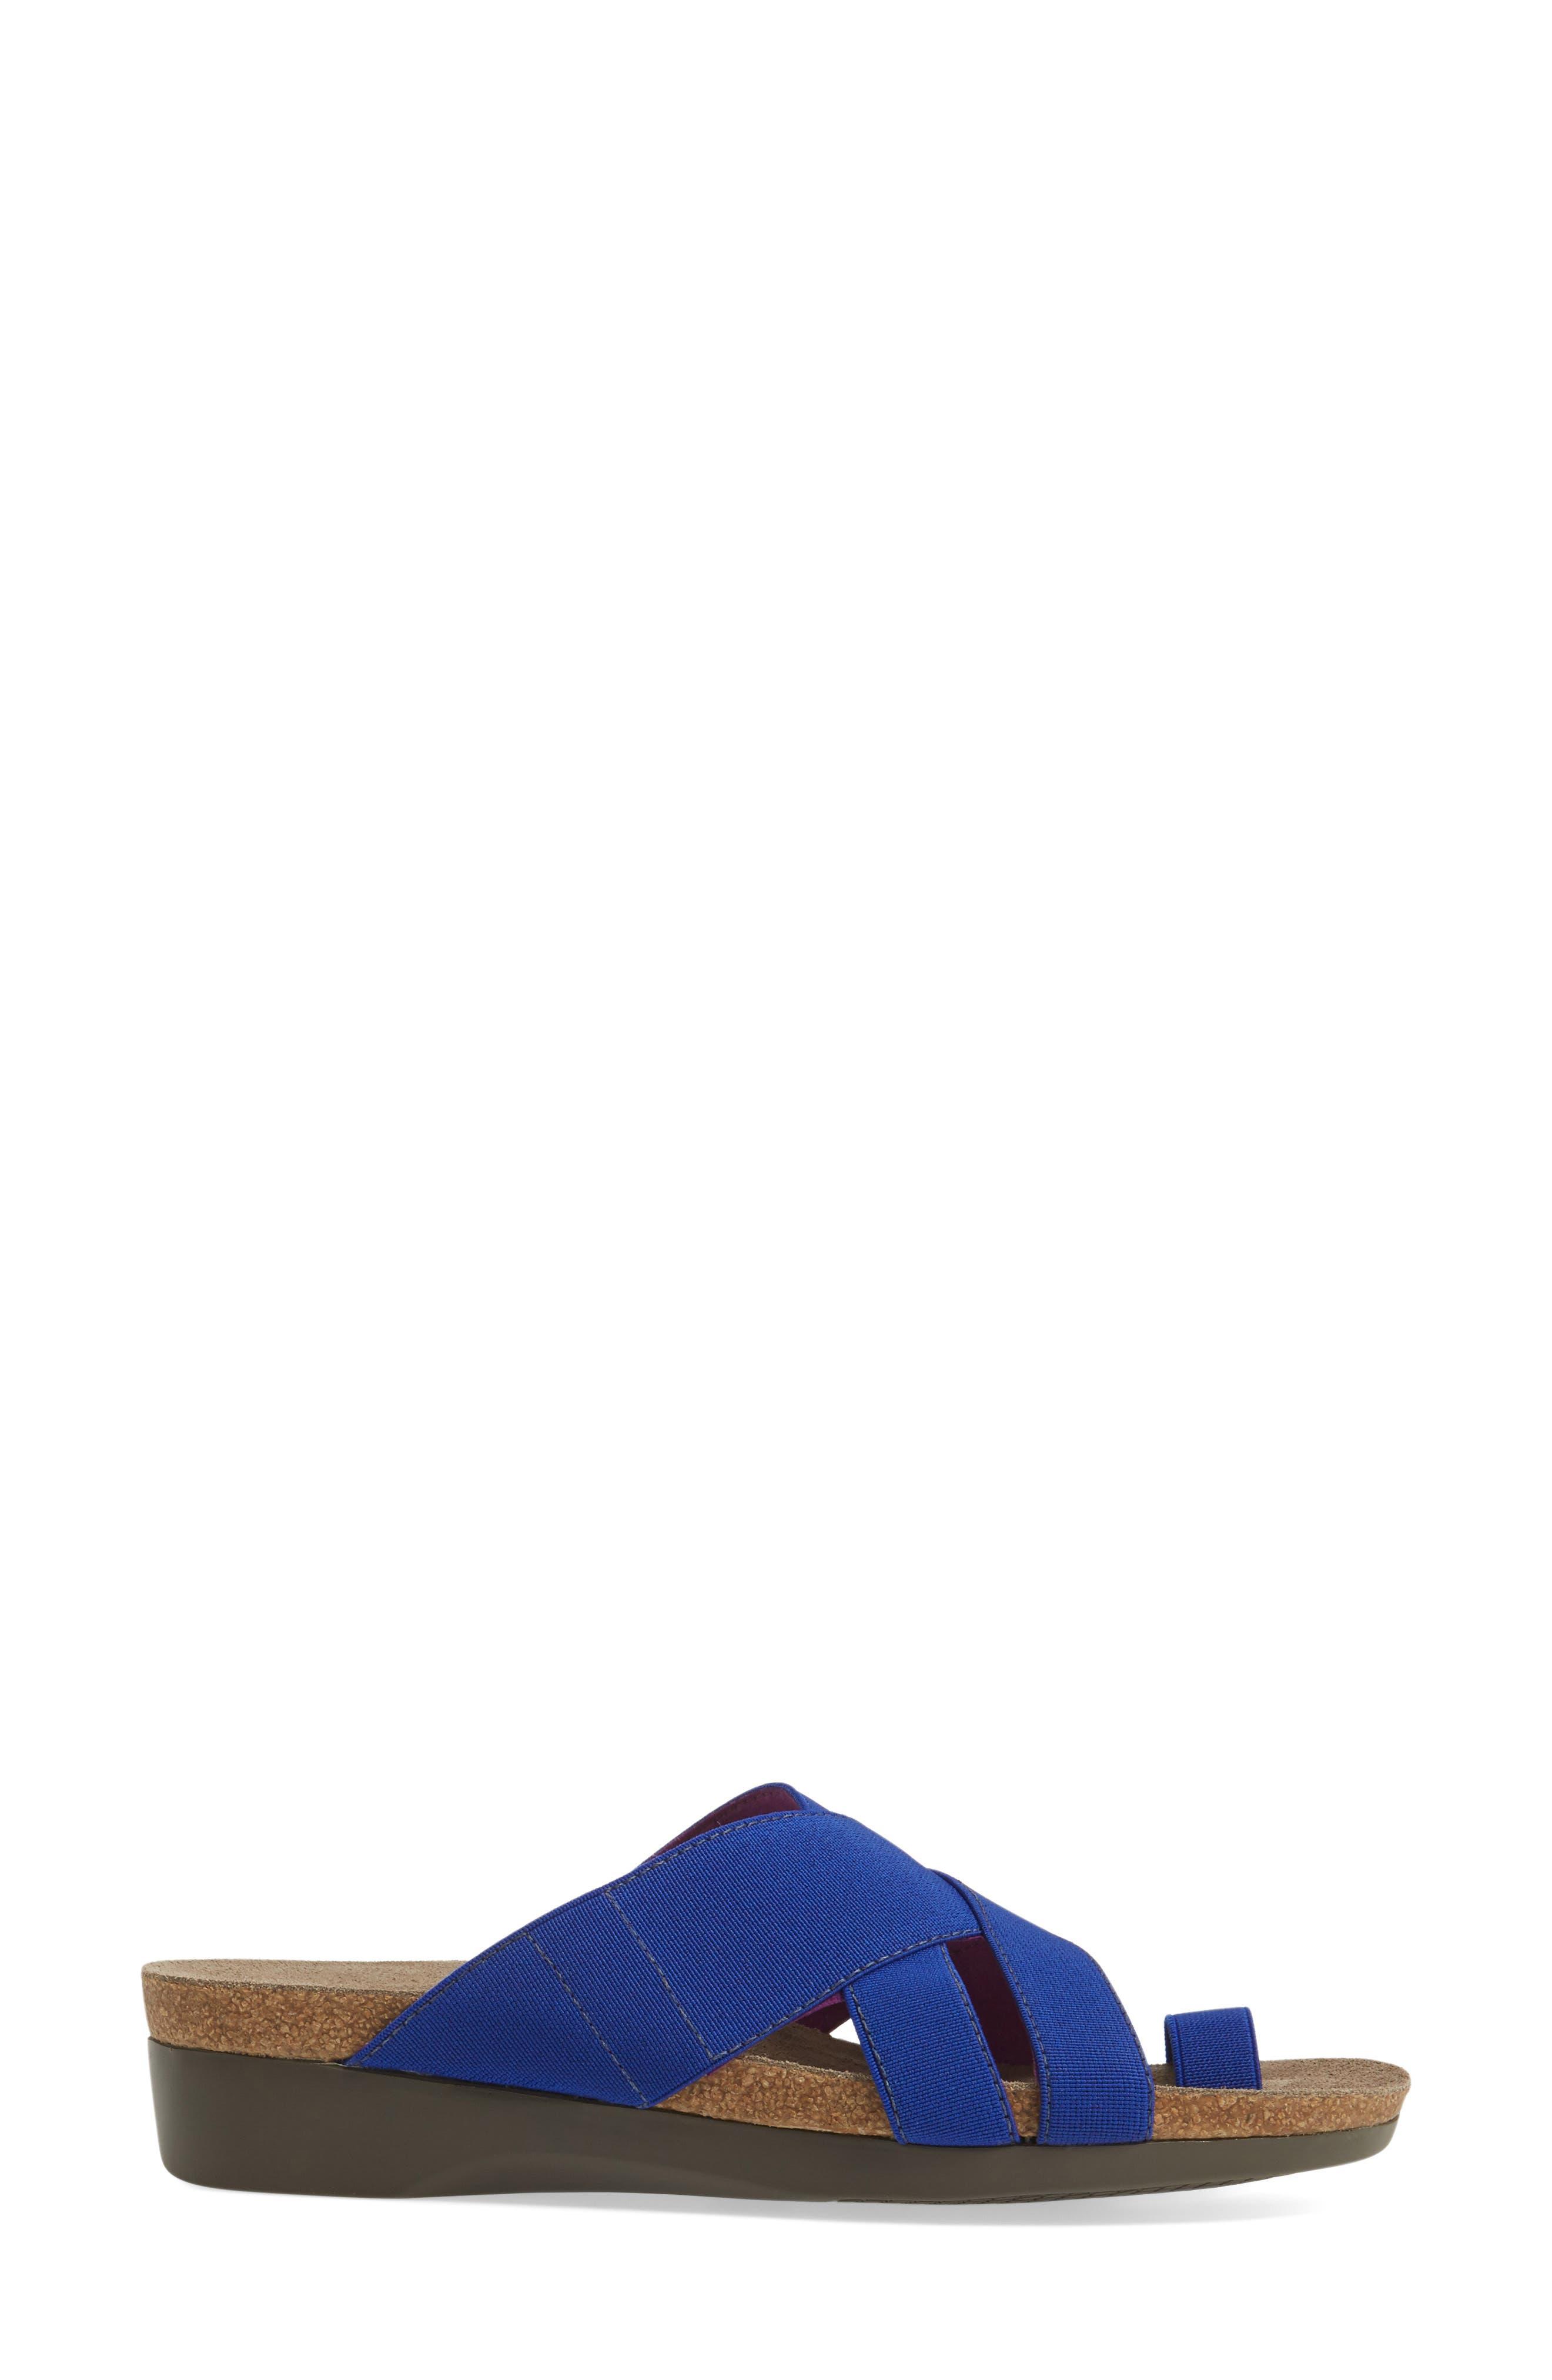 Delphi Slide Sandal,                             Alternate thumbnail 3, color,                             Blue Fabric